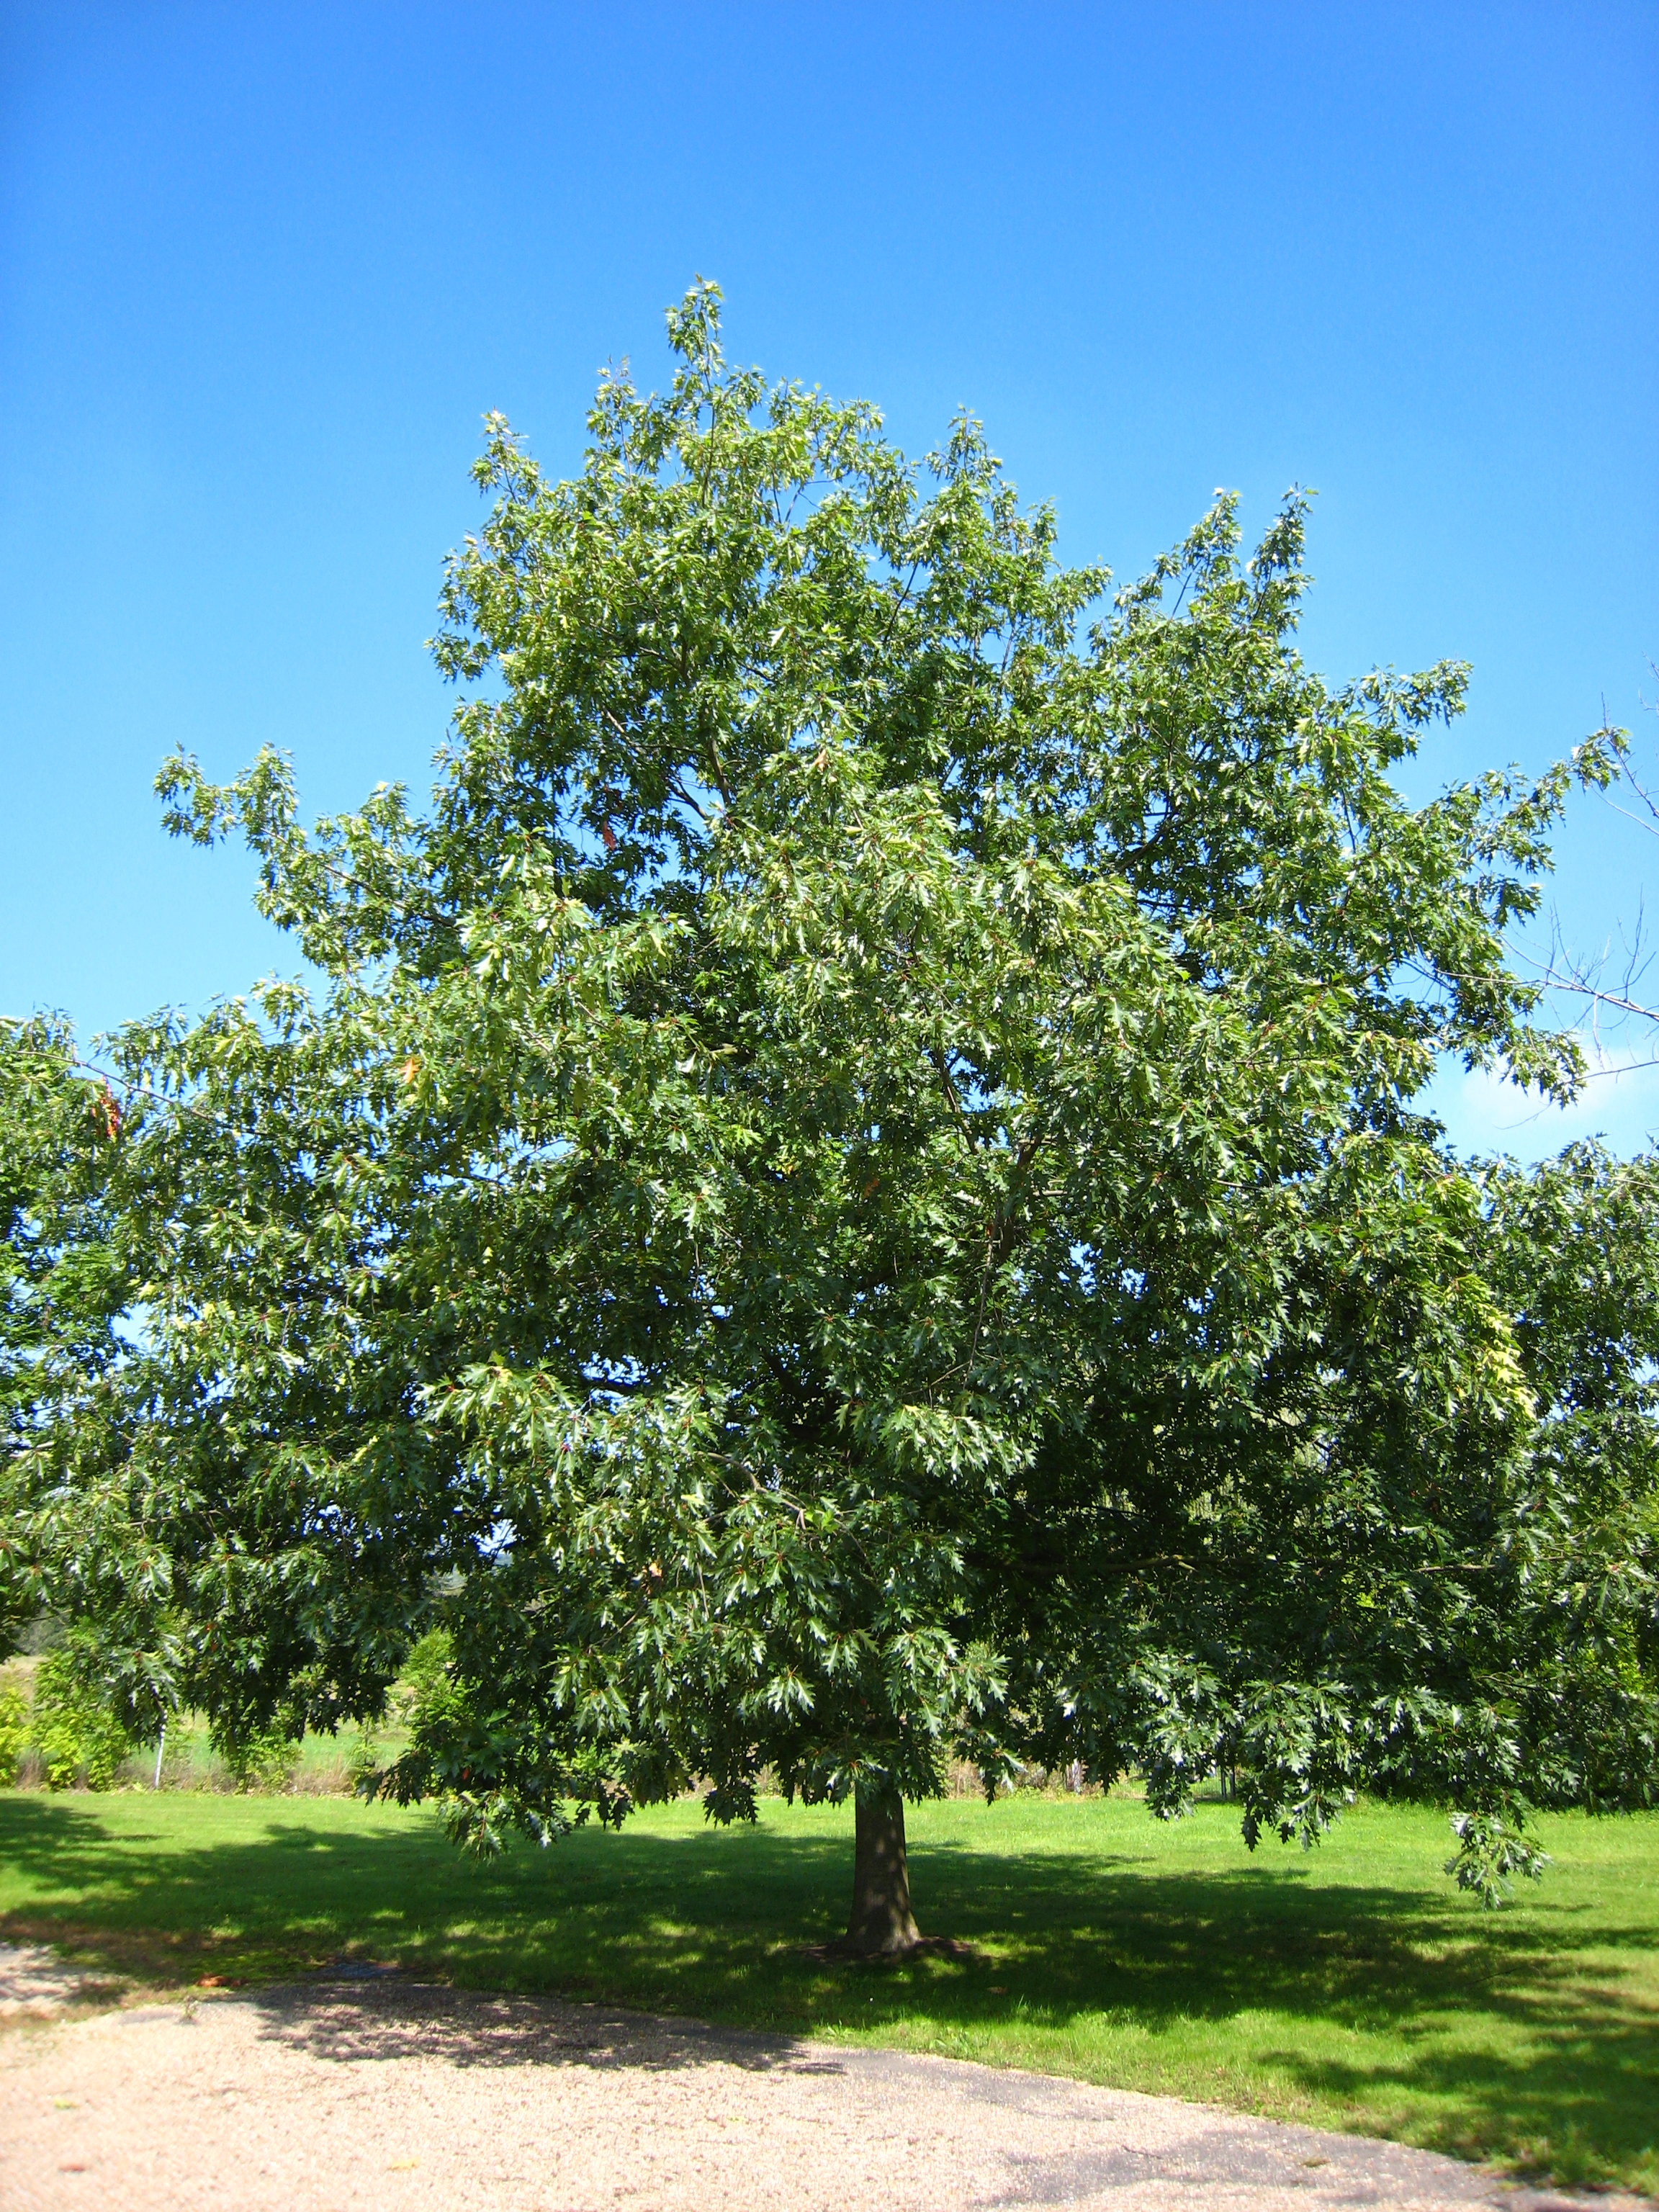 File:Quercus rubra.jpg - Wikimedia Commons